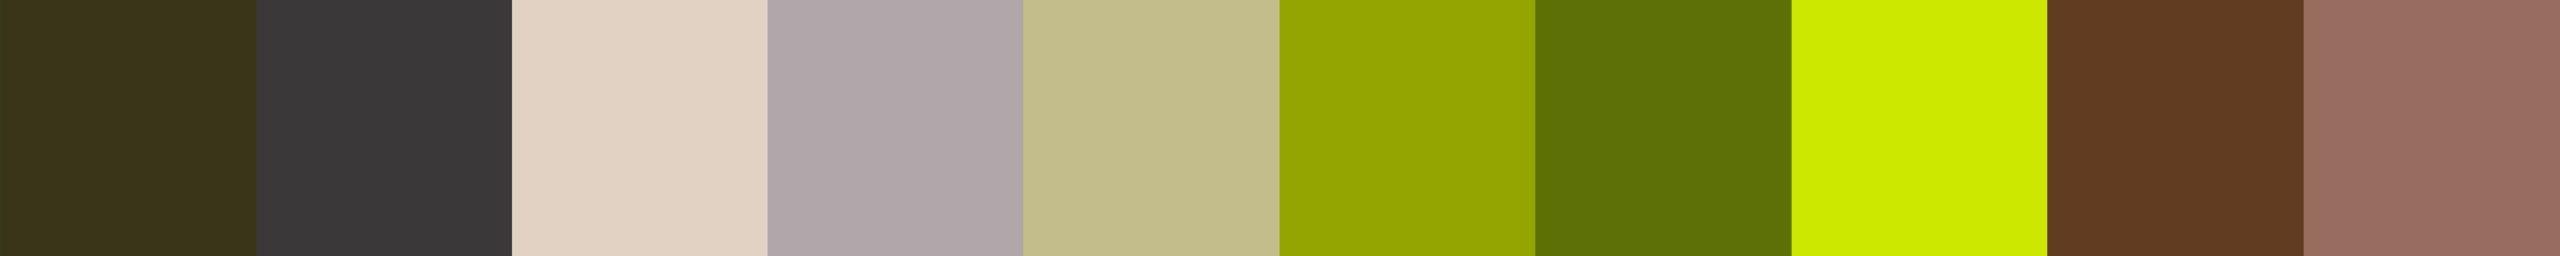 710 Wertas Color Palette